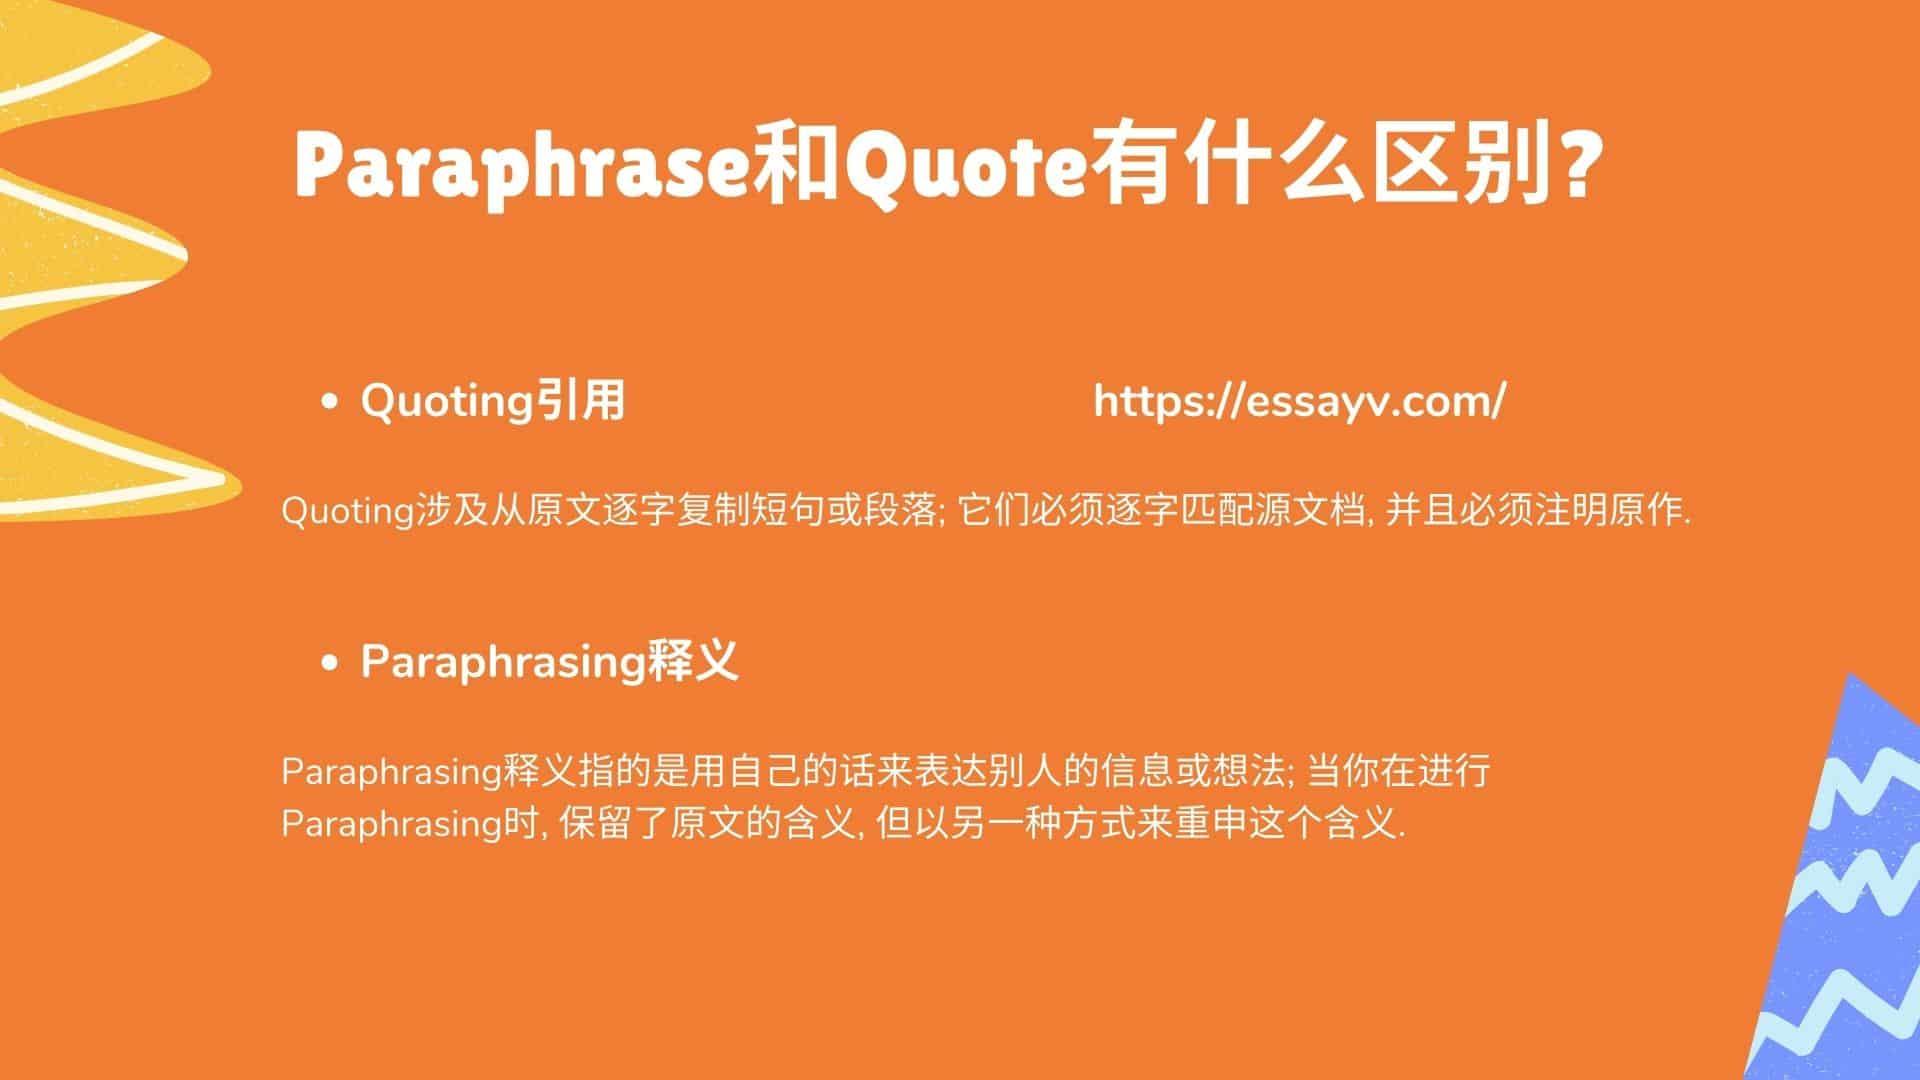 Paraphrase和Quote有什么区别